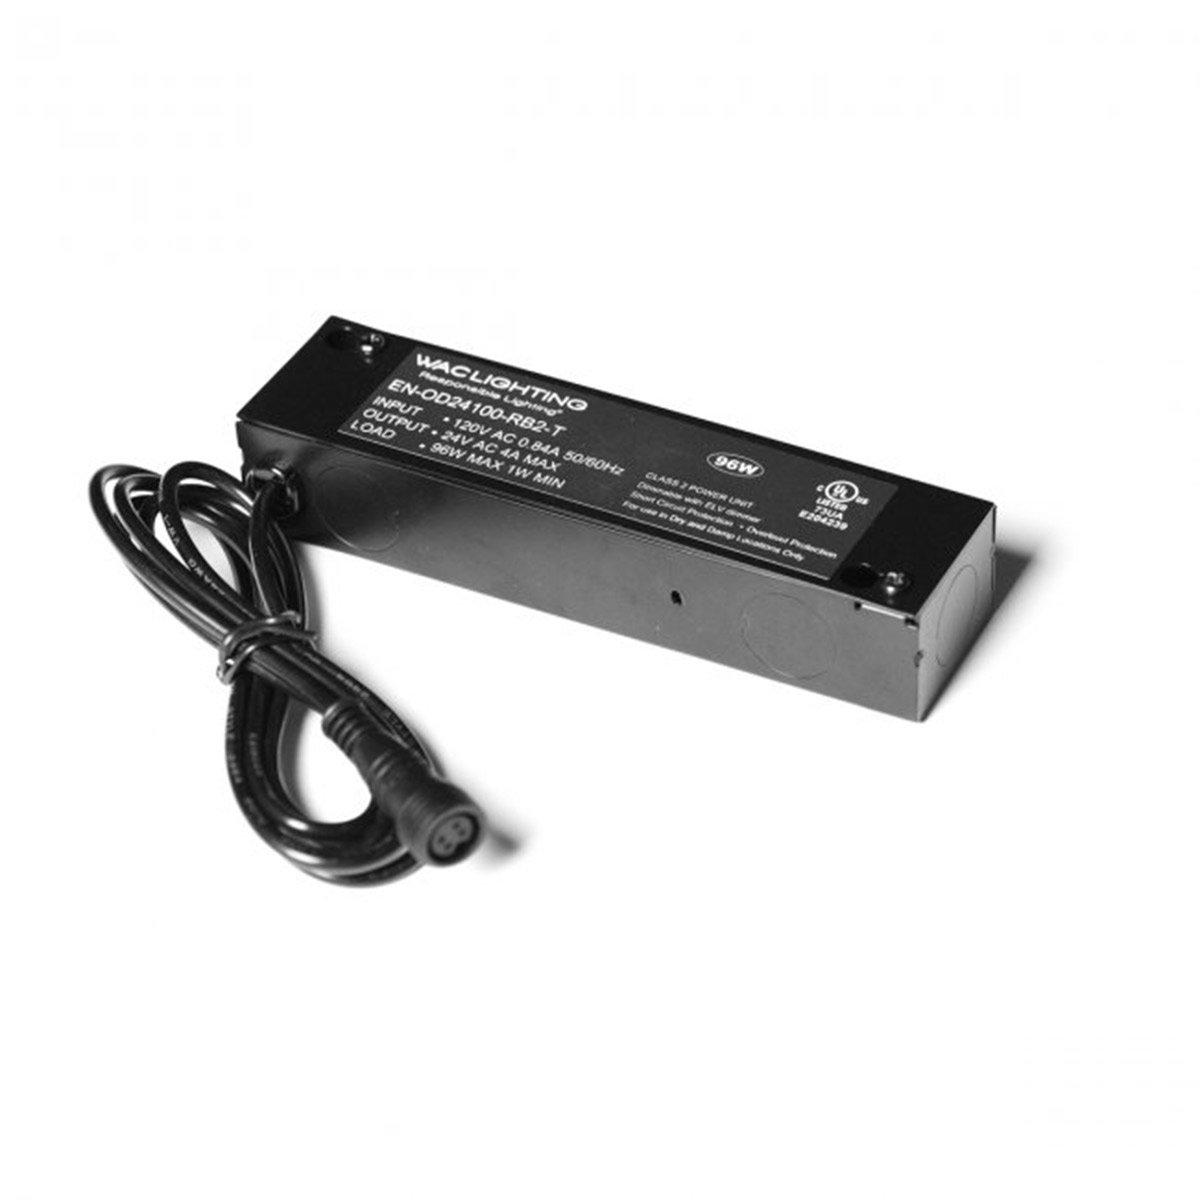 WAC Lighting EN-OD24100-RB2-T Remote Enclosed Electronic Transformer for Outdoor RGB 120V Input 24V Output 100 Watt, Black by WAC Lighting